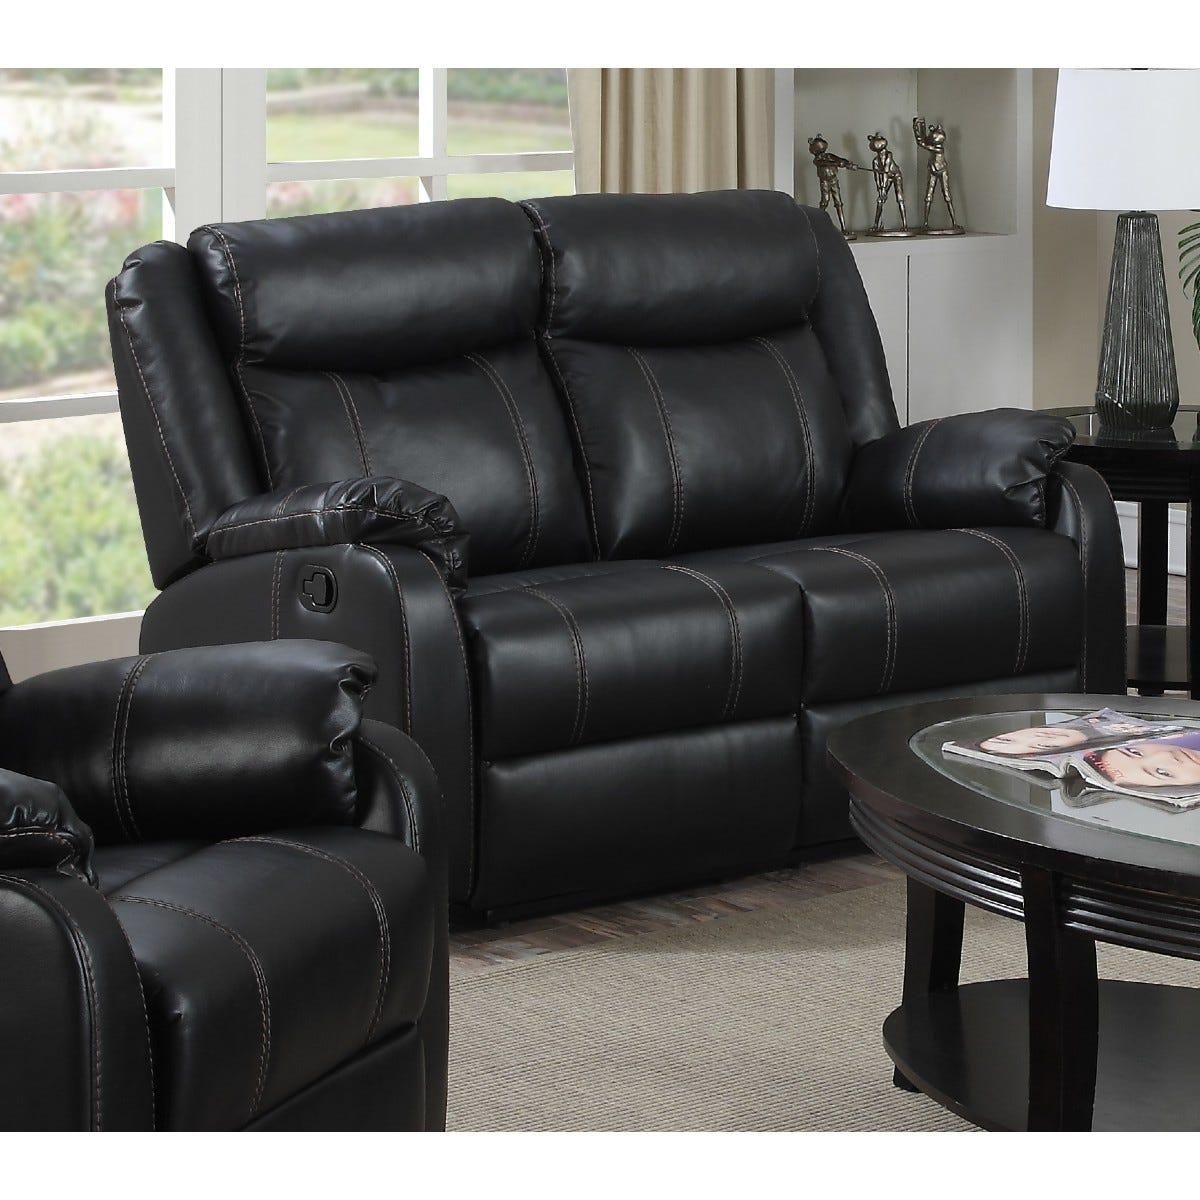 Ledbury Faux Leather Reclining 2 Seater Sofa Gunmetal